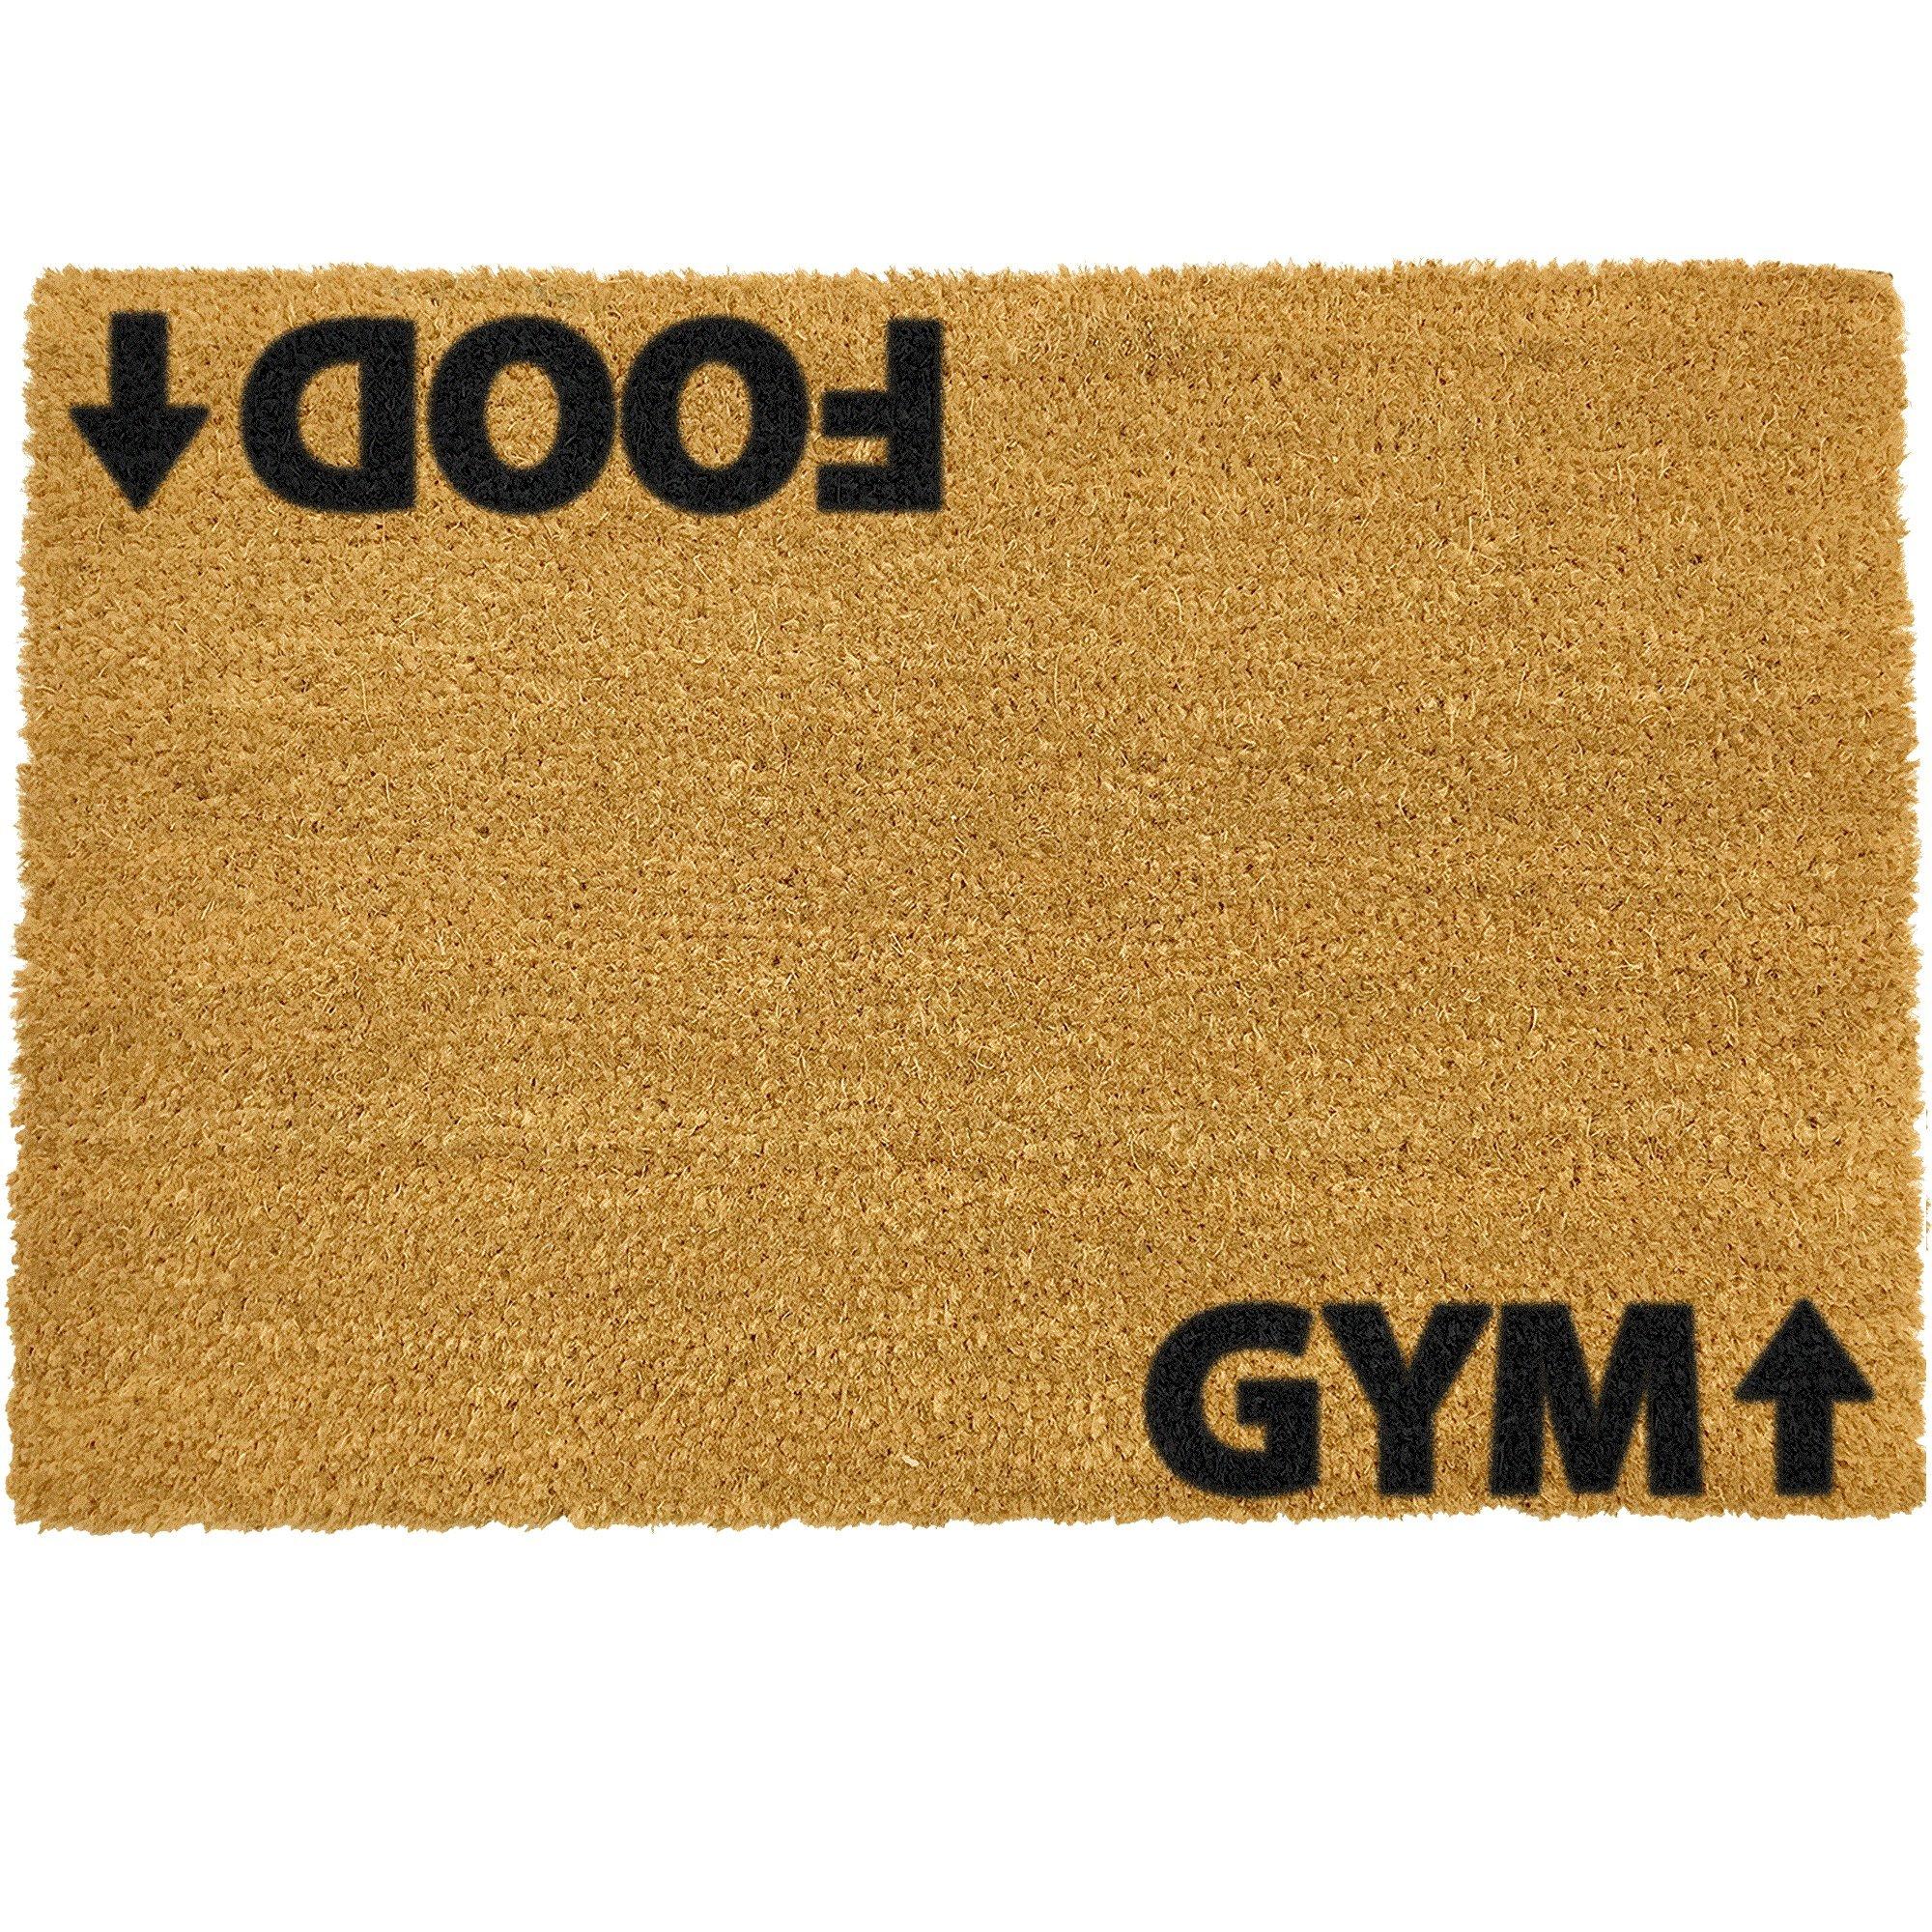 CKB Ltd Food Gym Novelty Doormat Unique Doormats Front / Back Door Mats Made With A Non-Slip Pvc Backing - Natural Coir - Indoor & Outdoor by CKB Ltd